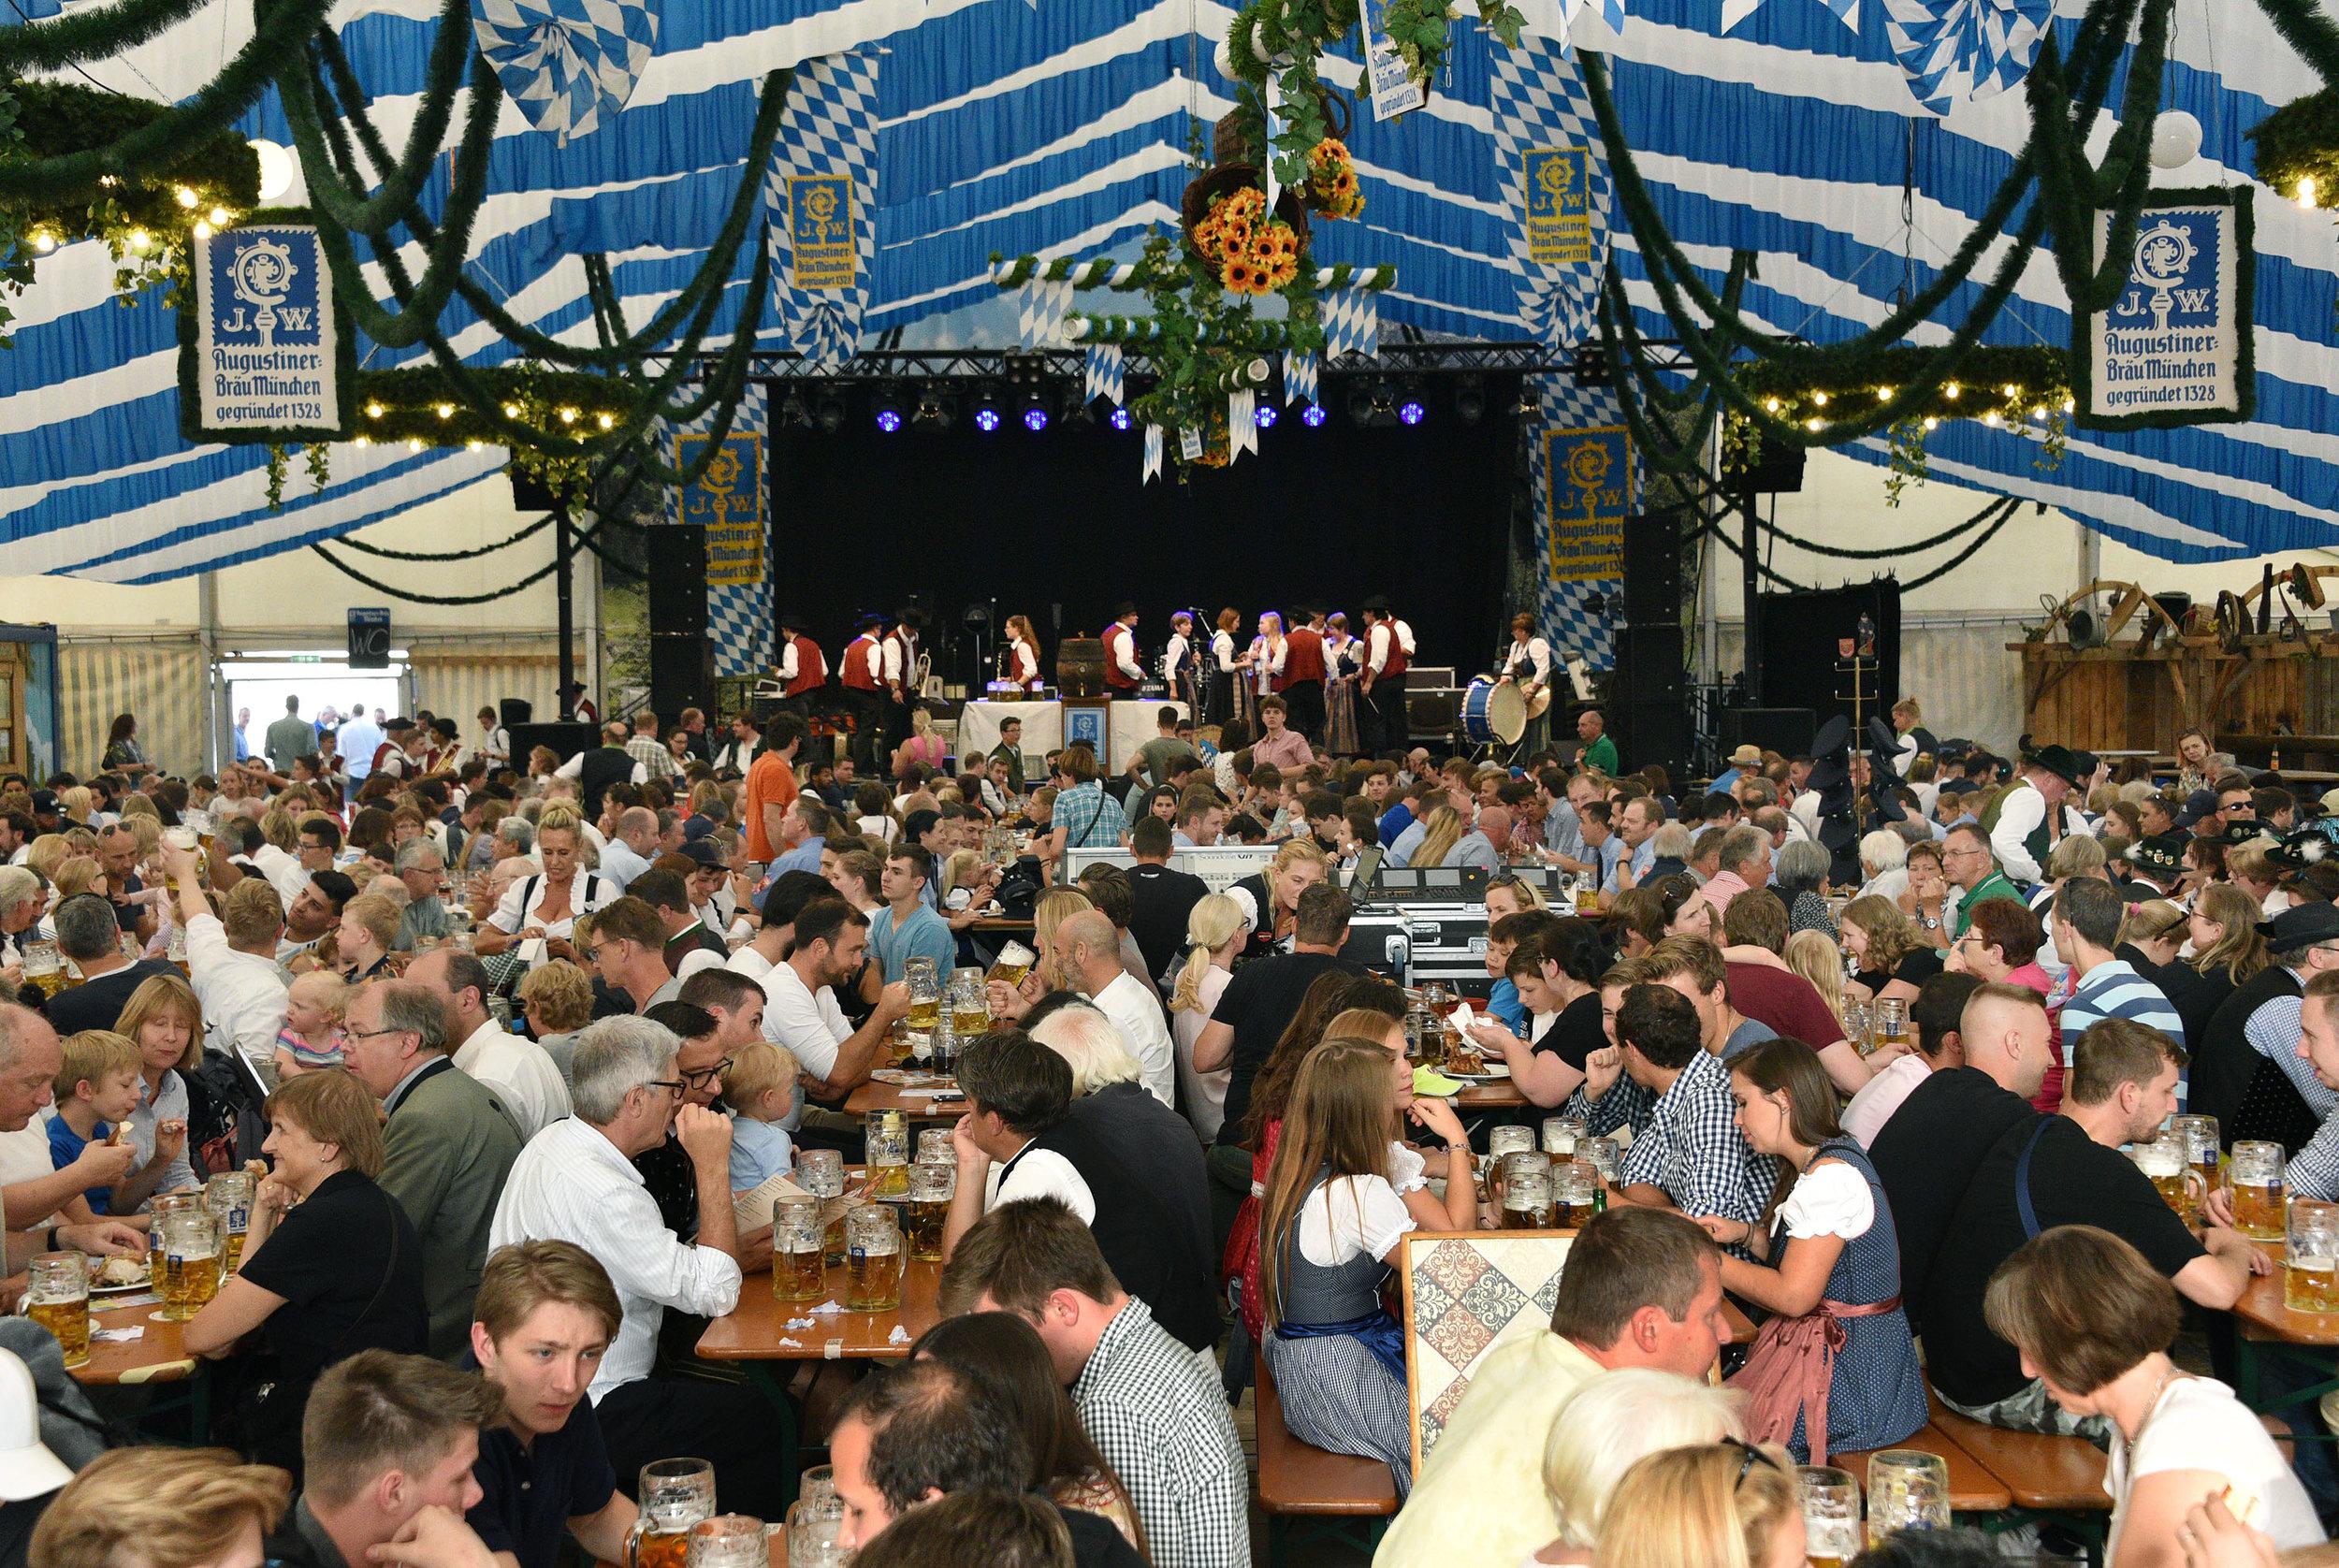 Bürgerfest Unterföhring 2018.jpg